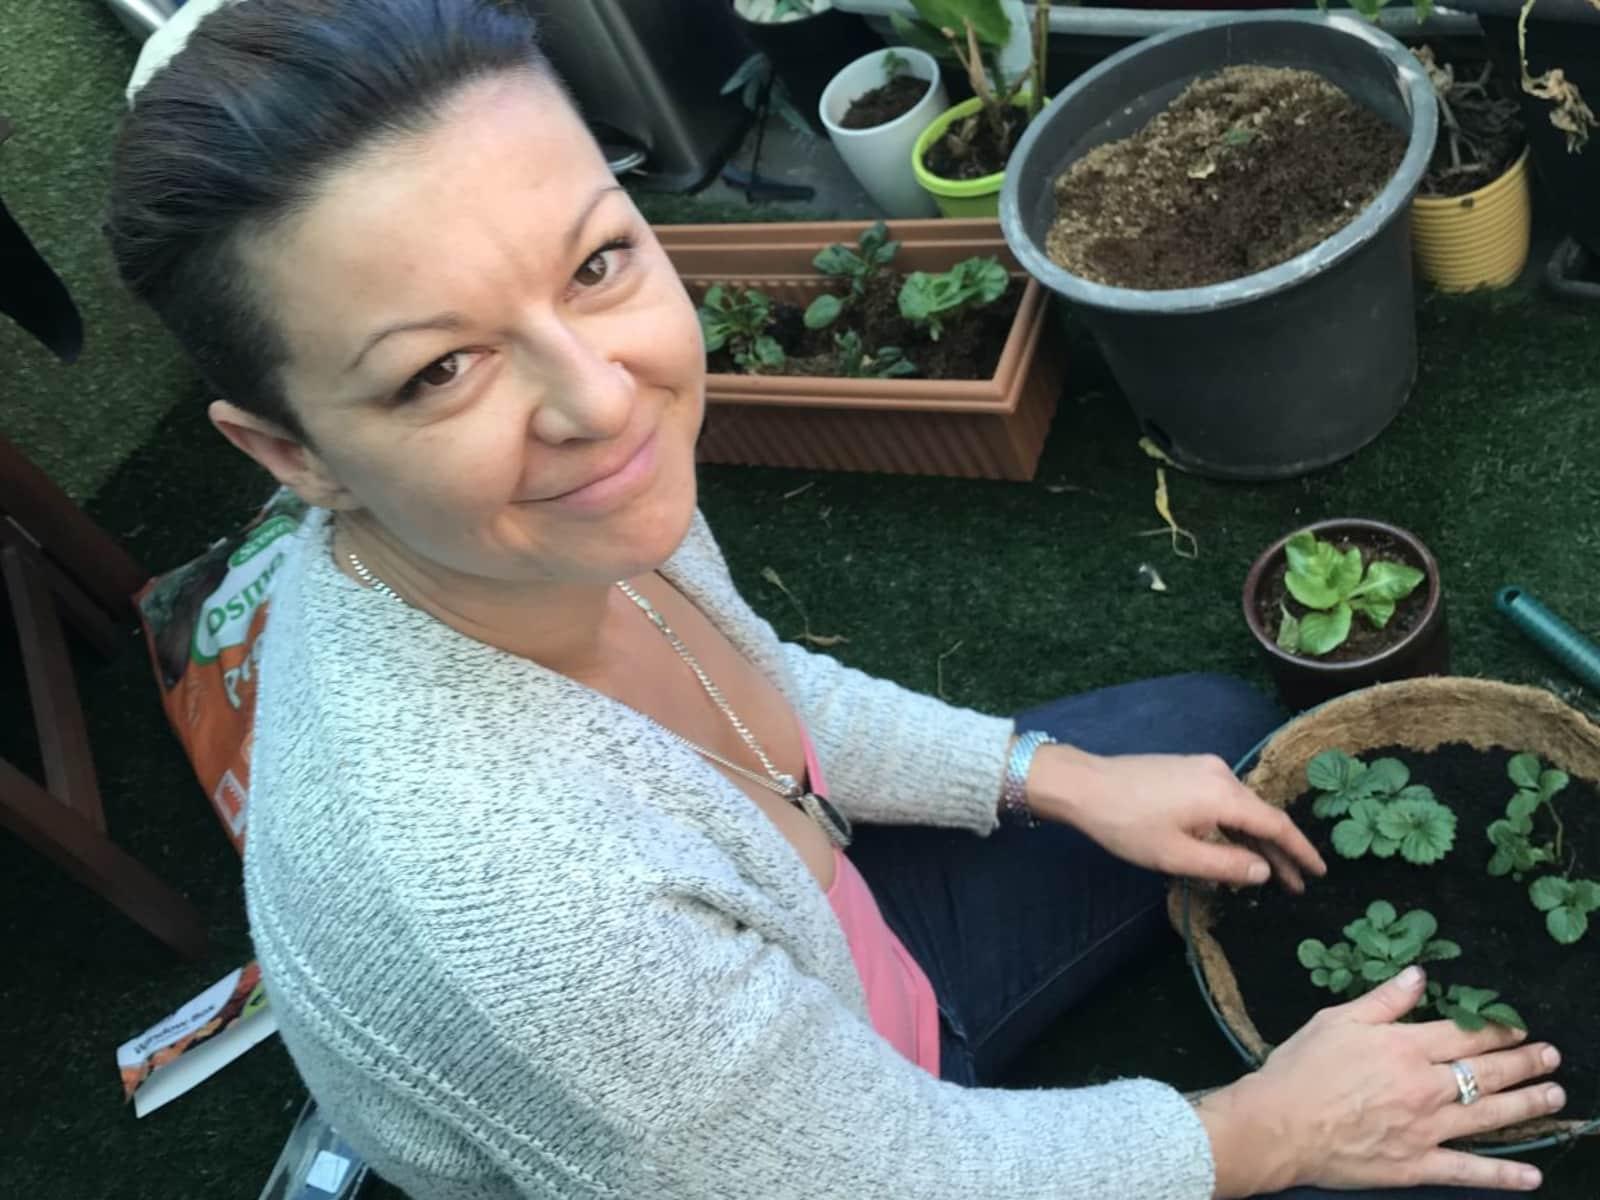 Karen from Sydney, New South Wales, Australia